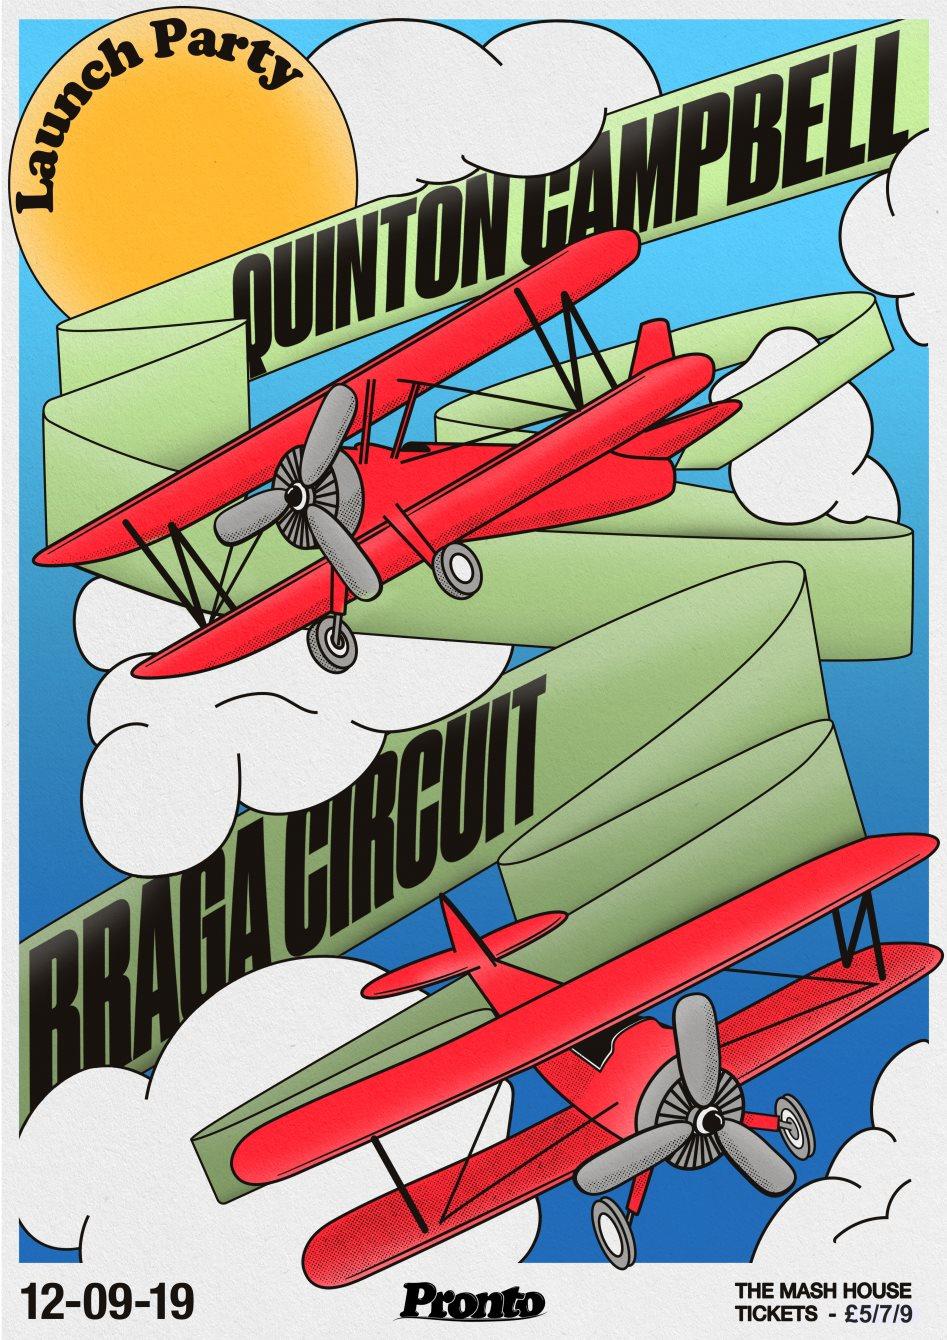 Pronto Launch Party: Quinton Campbell & Braga Circuit - Flyer front